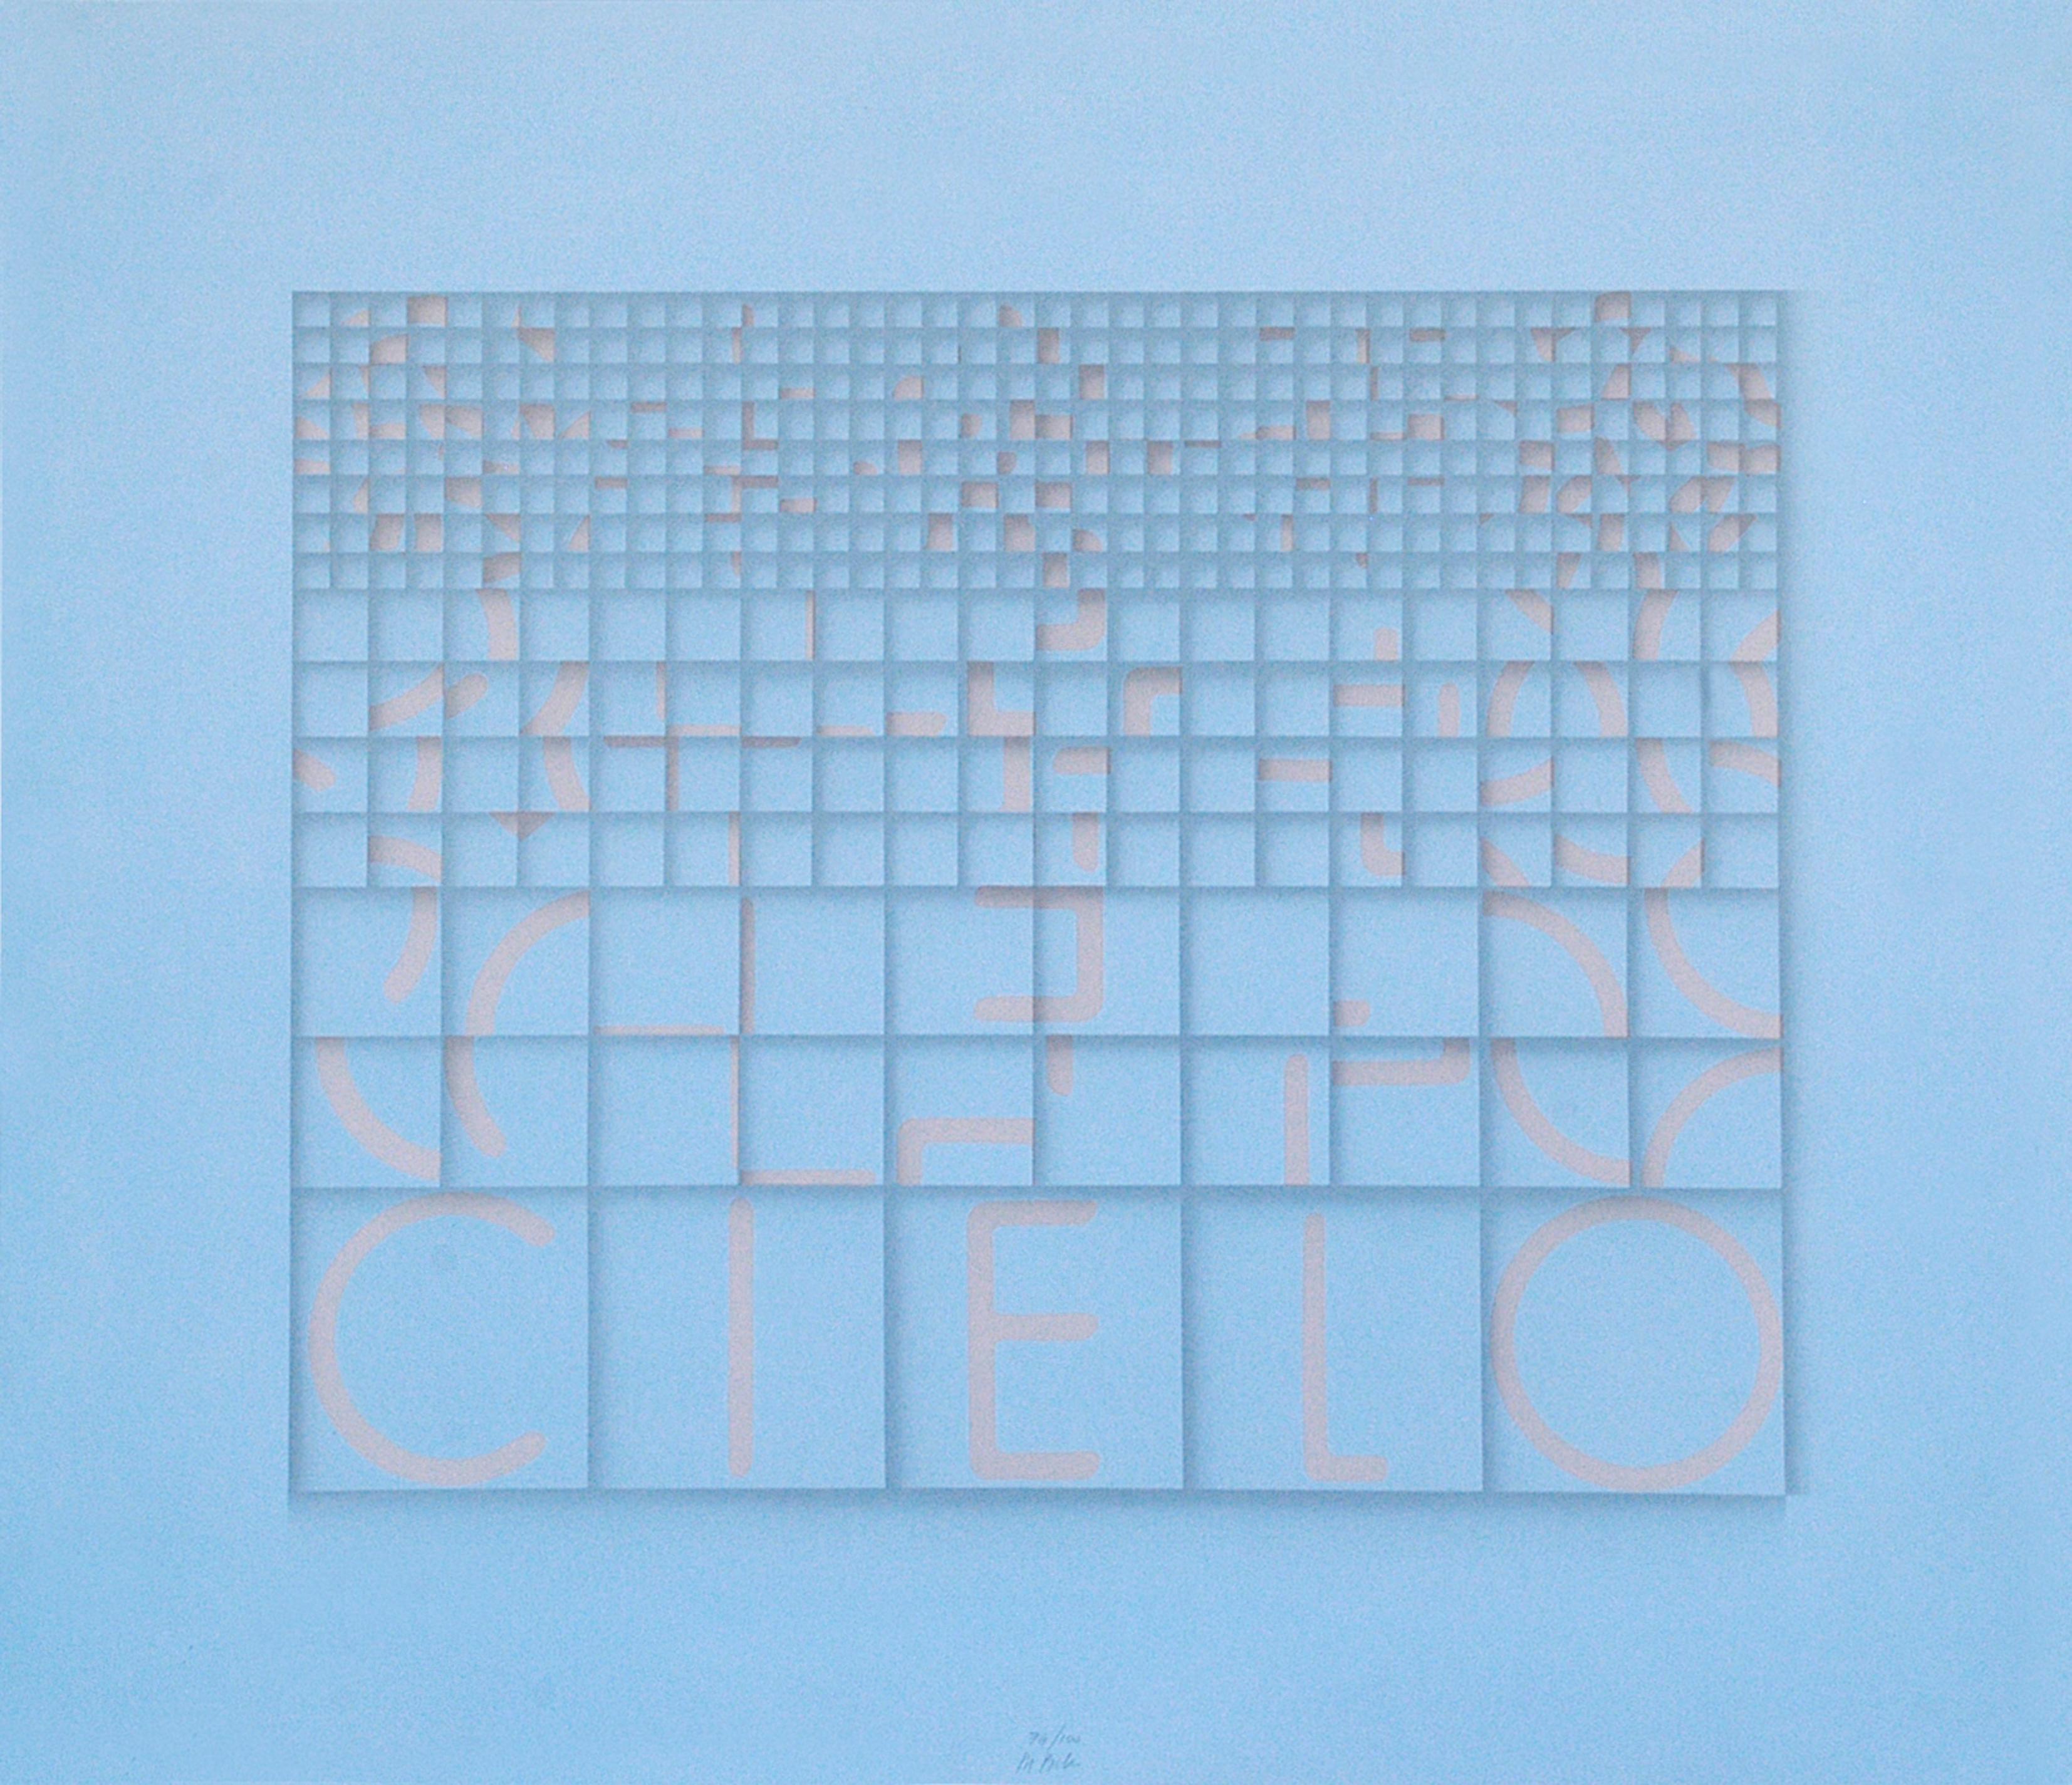 Cielo (Sky) - Original Screen Print by Bruno di Bello - 1980 ca.